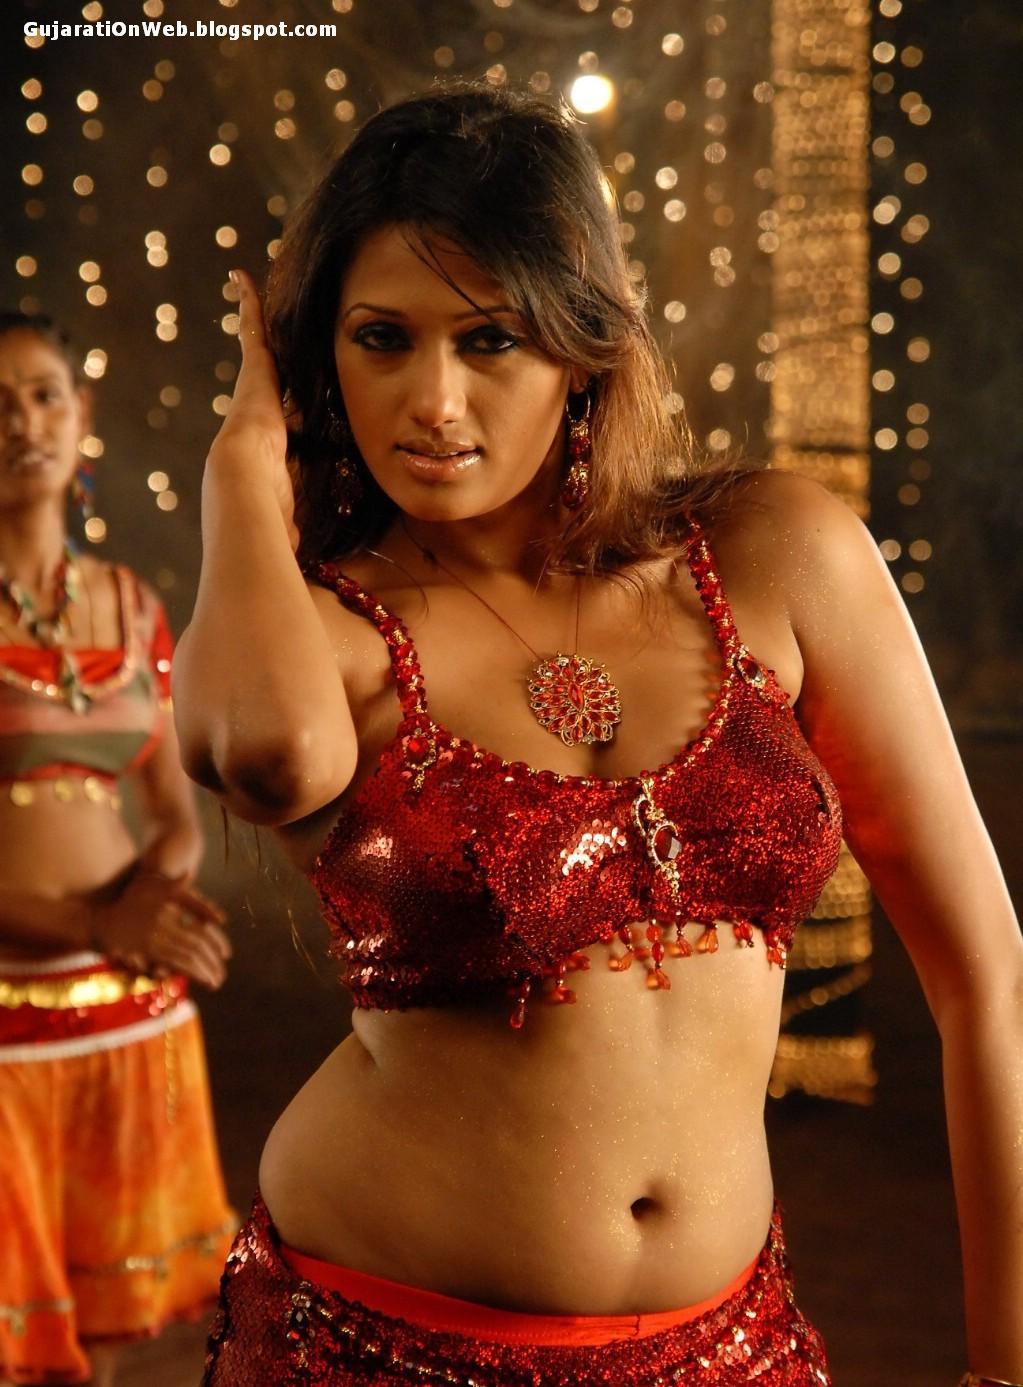 Gujarati On Web Brinda Parekh Doing Slutry Dance Pics-4392